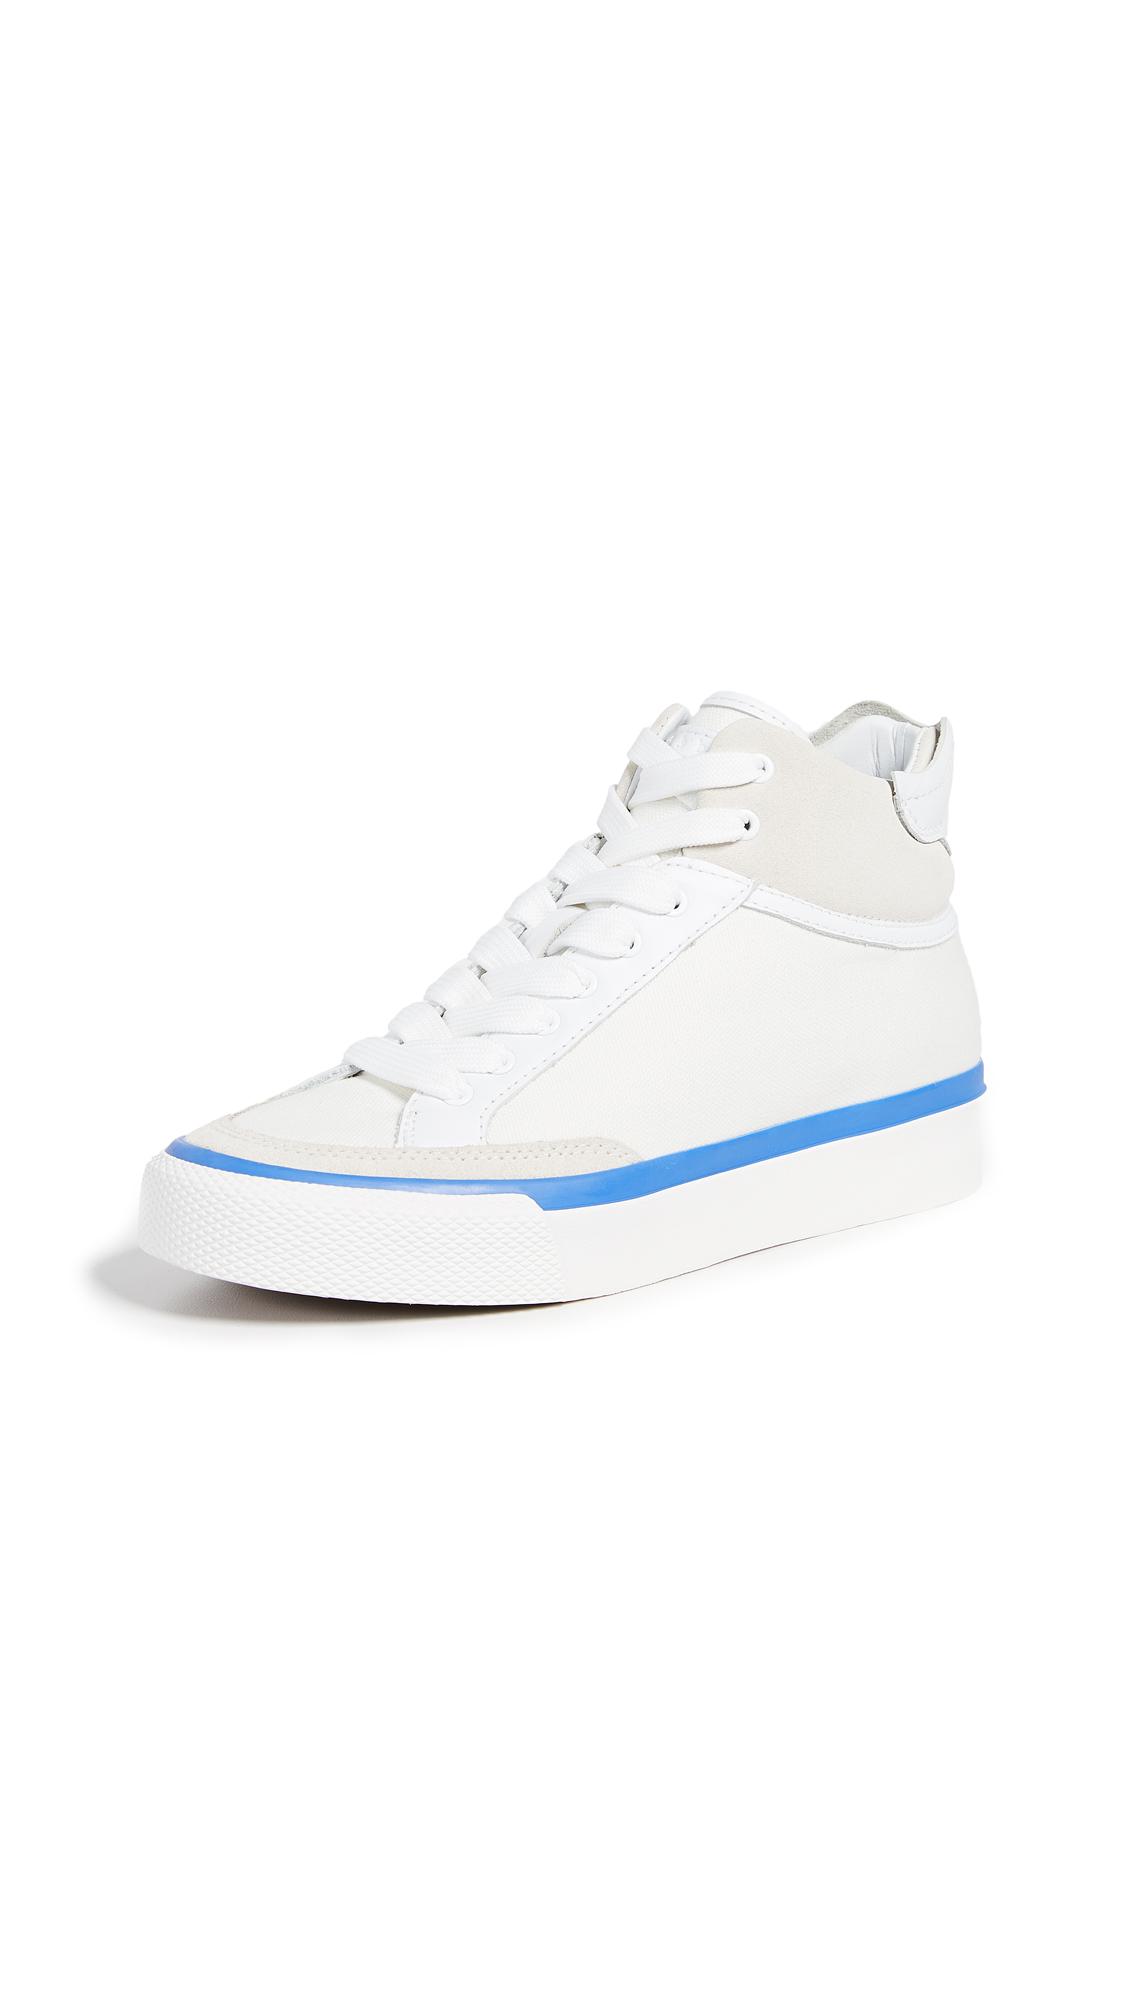 Rag & Bone RB Army High Sneakers - White/Blue